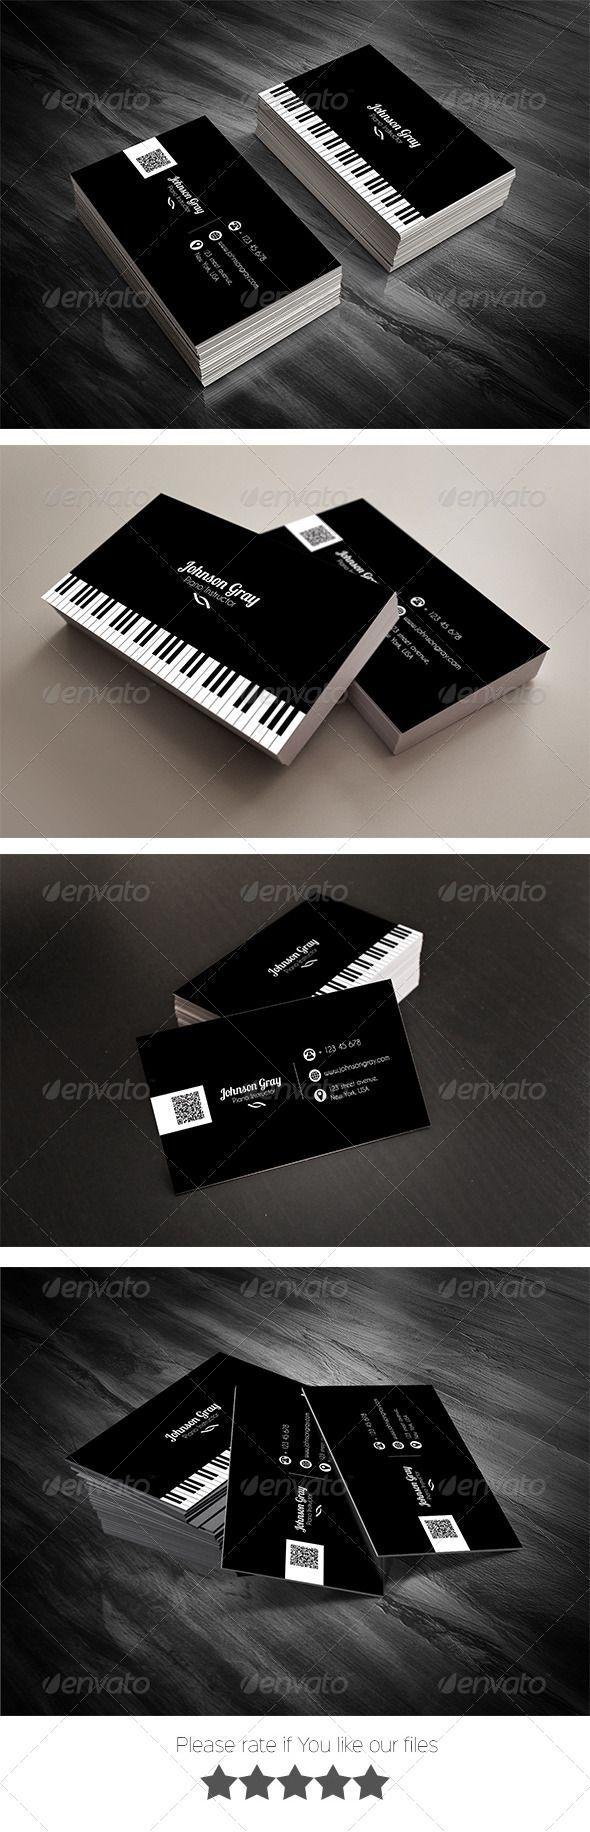 Musician Business Card Template #card #vcard Download: http://graphicriver.net/item/musician-business-card/8030356?ref=ksioks